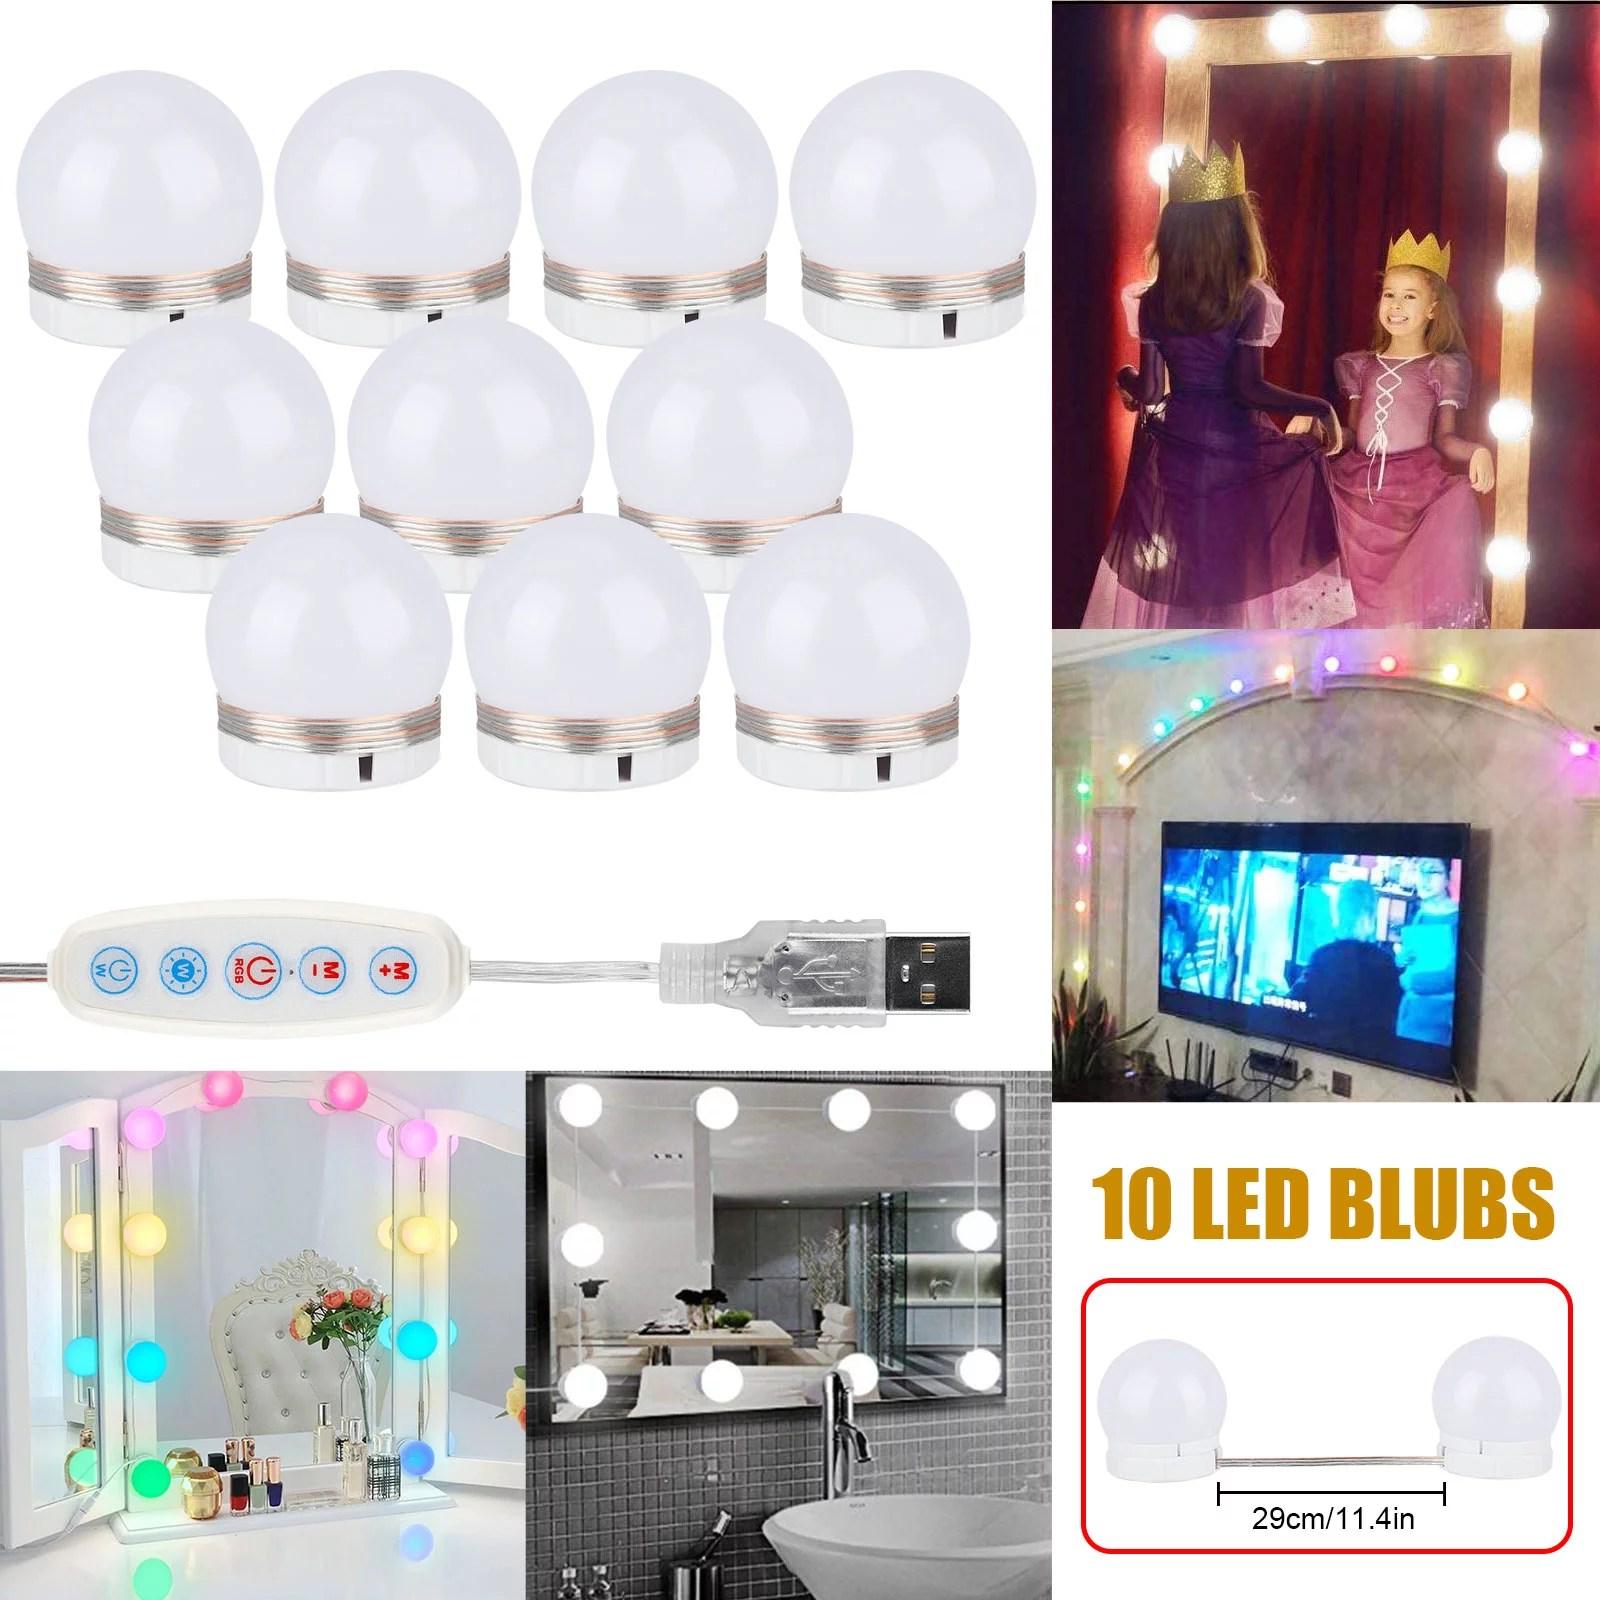 tsv vanity lights for mirror adjustable rgb color diy hollywood style led vanity mirror lights dimmable brightness 10 light bulbs lighting for